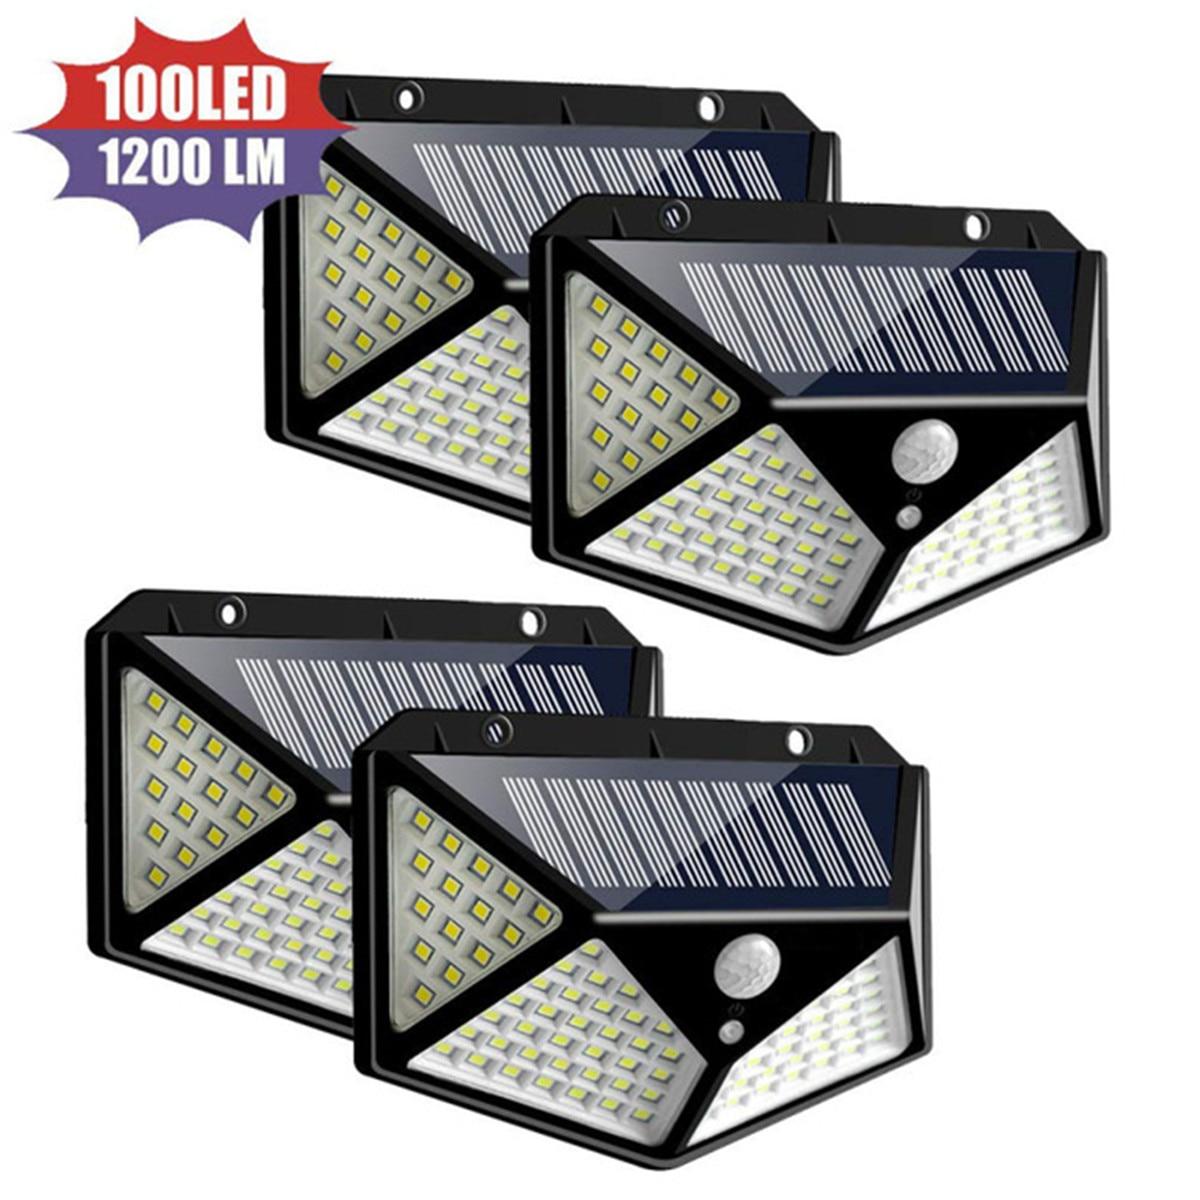 4pcs LED Solar Light Outdoor Waterproof 4-side Solar Powered Lamp 120 degree PIR Motion Sensor Wall Light Garden Yard luz solar